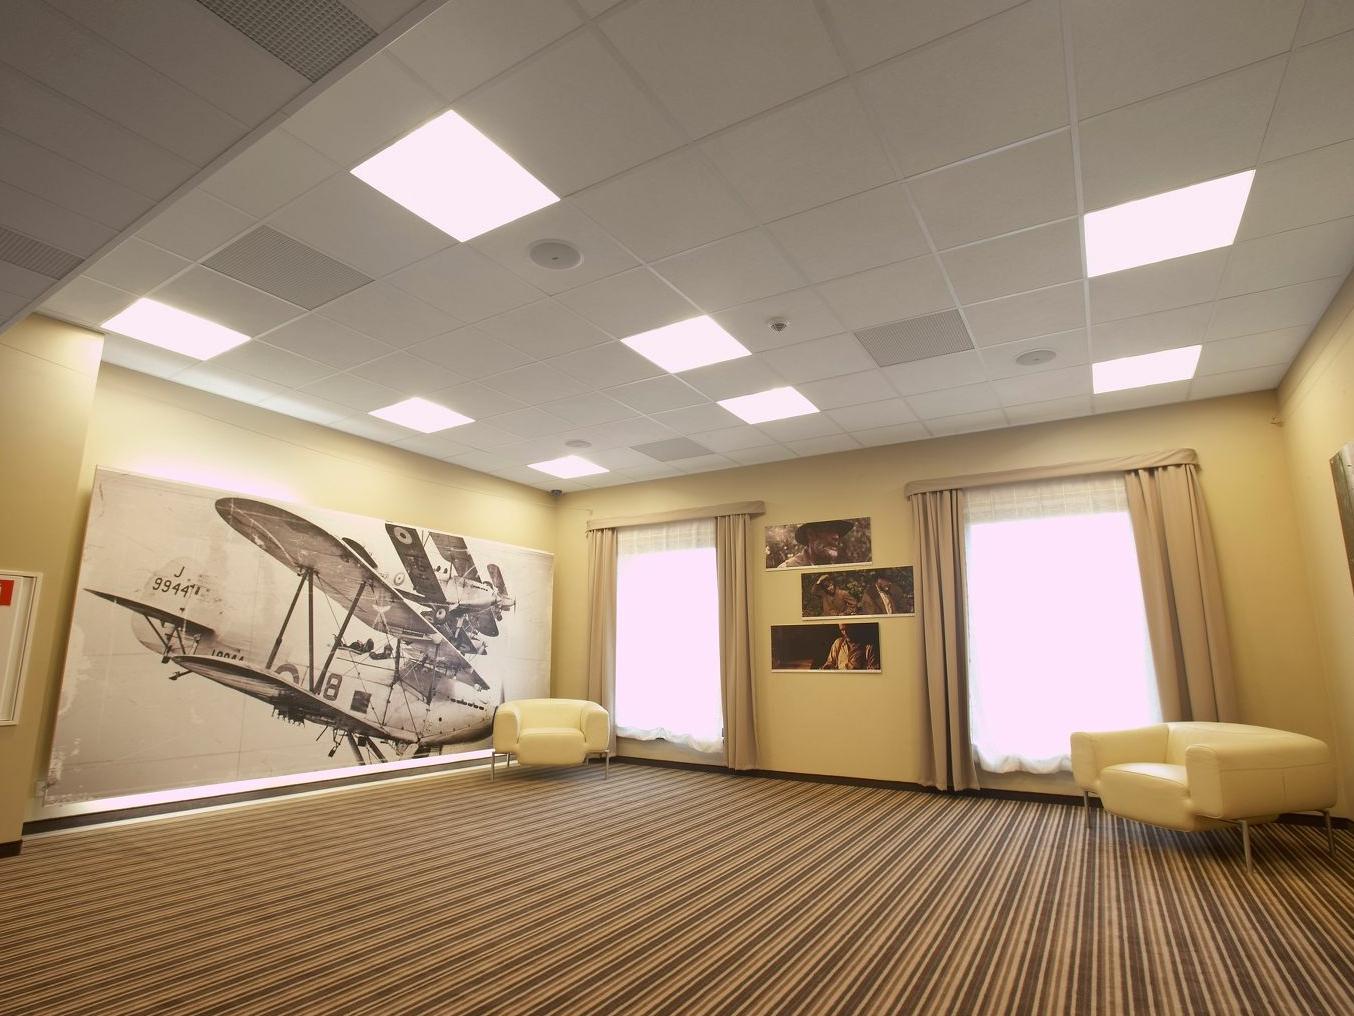 Комната с потолком Армстронг